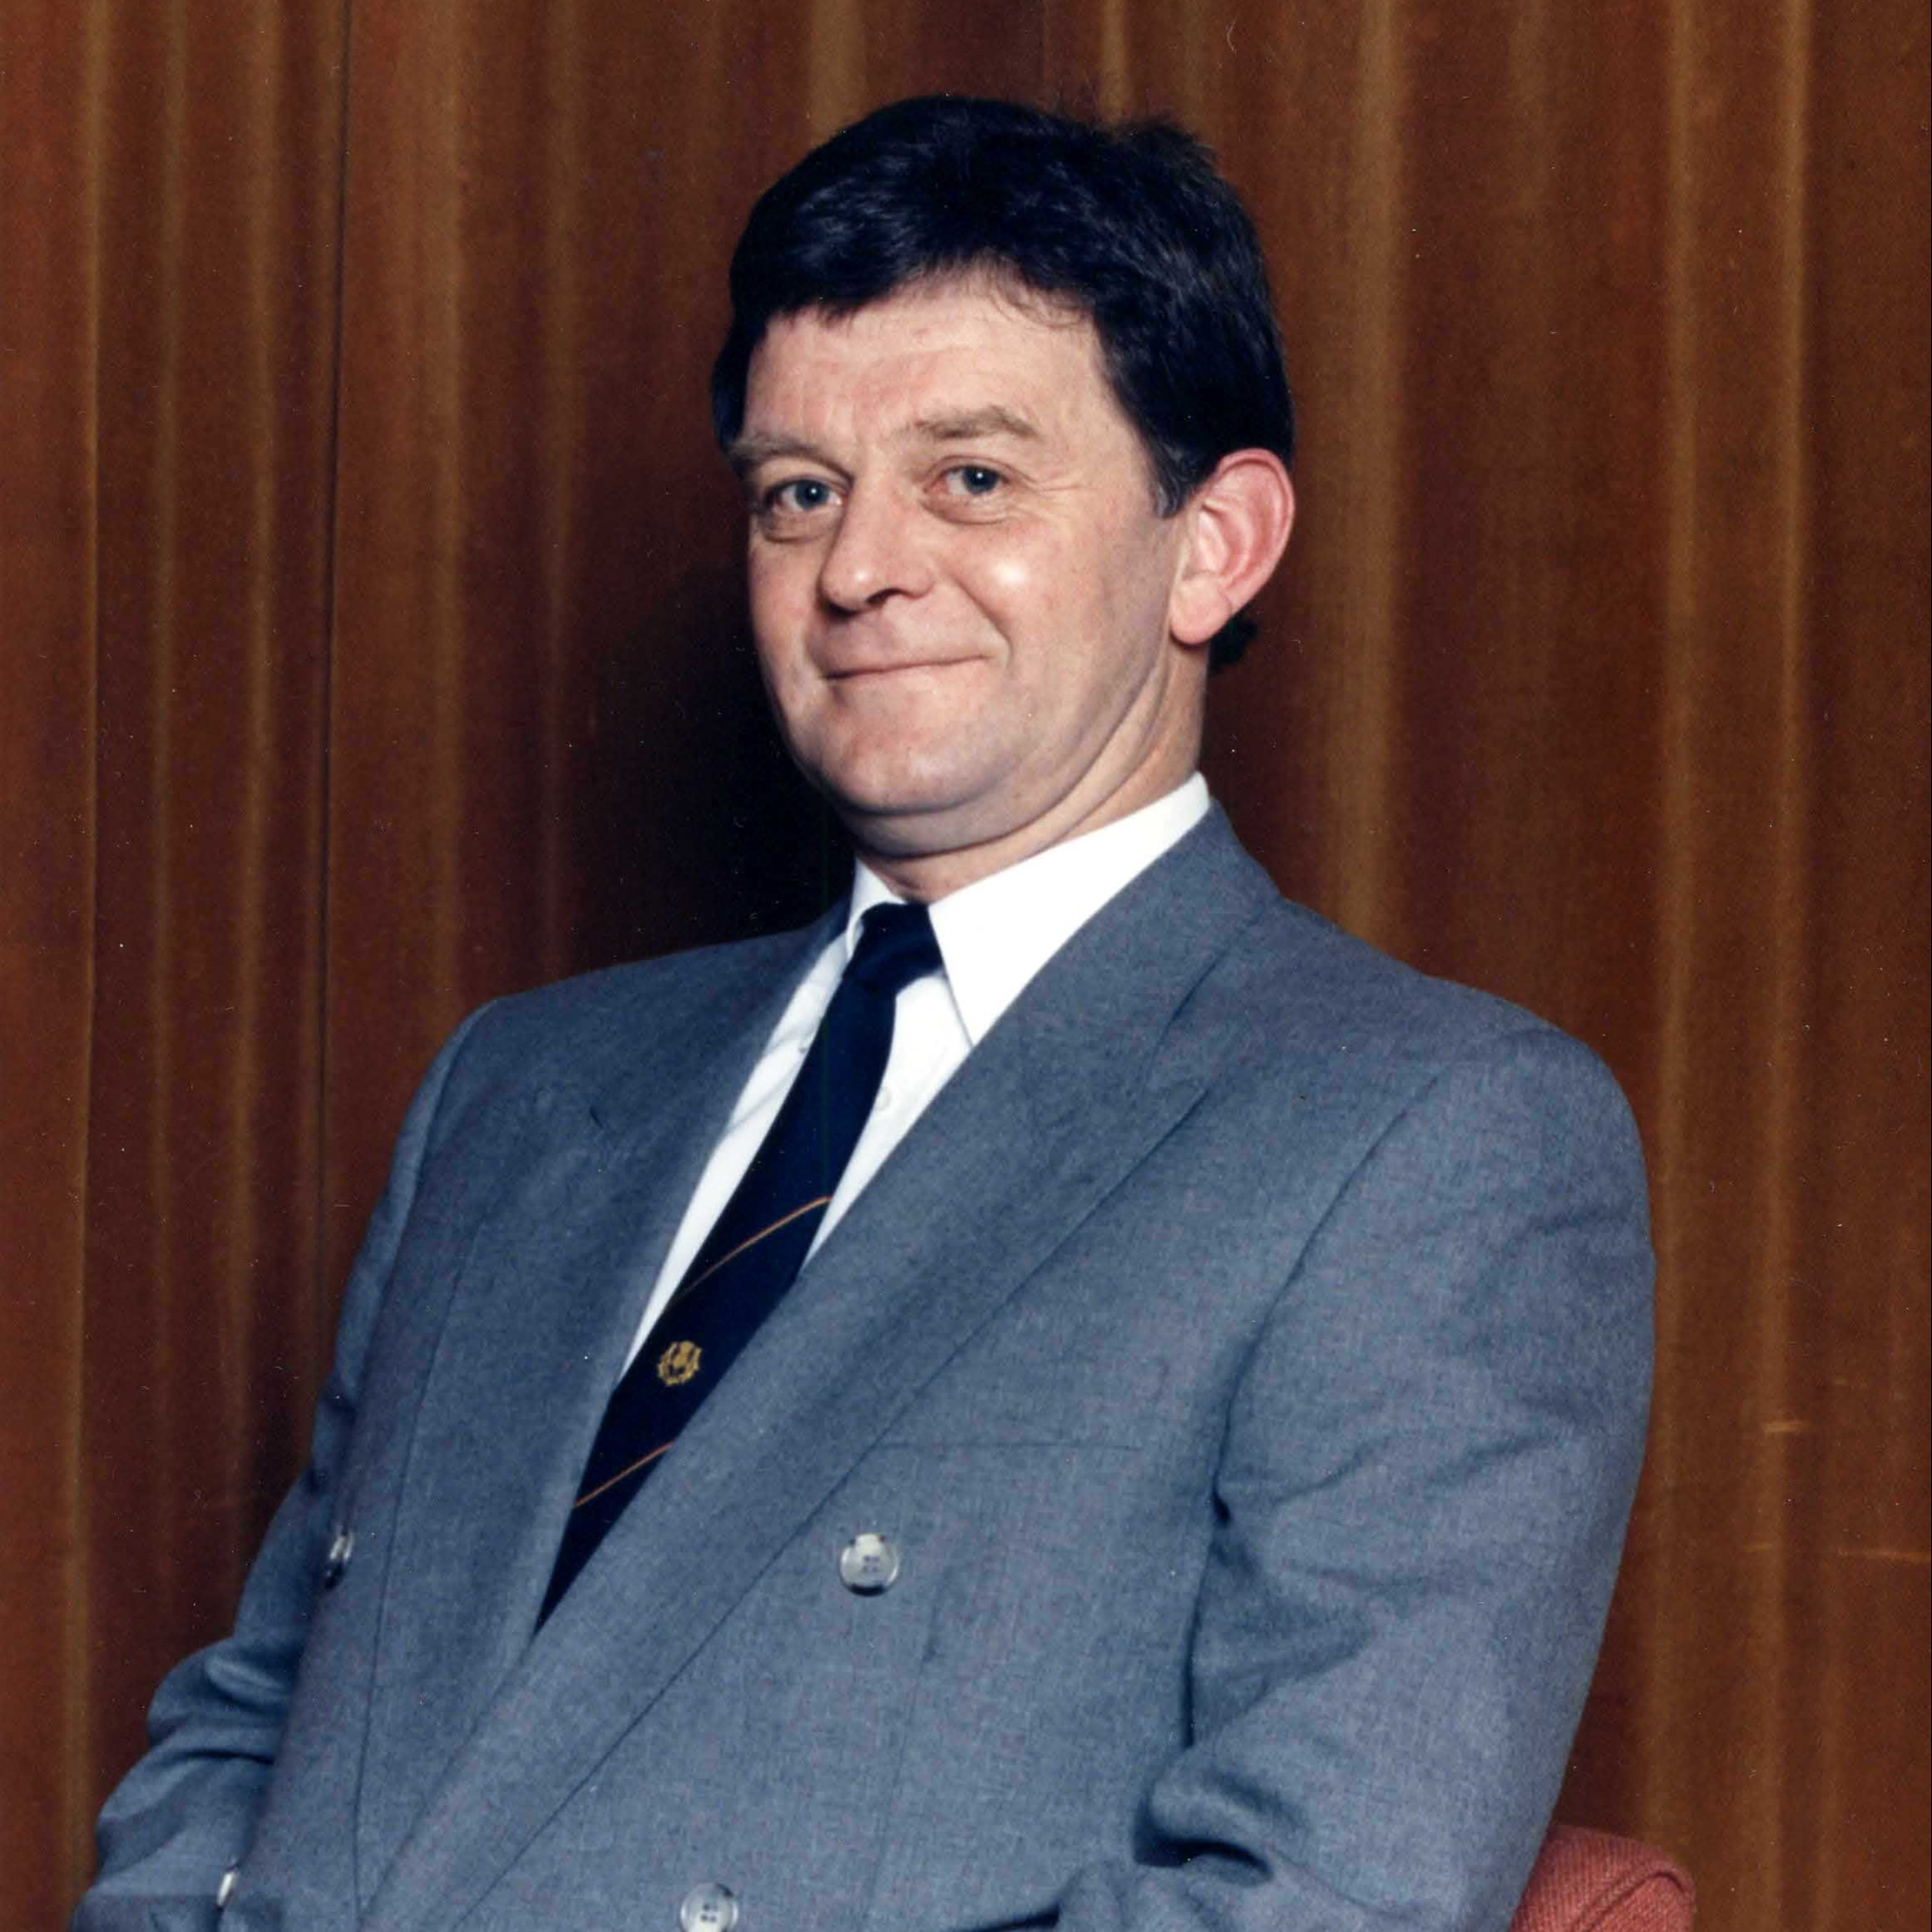 A D Wight - 1981-1983 - 1991-1993